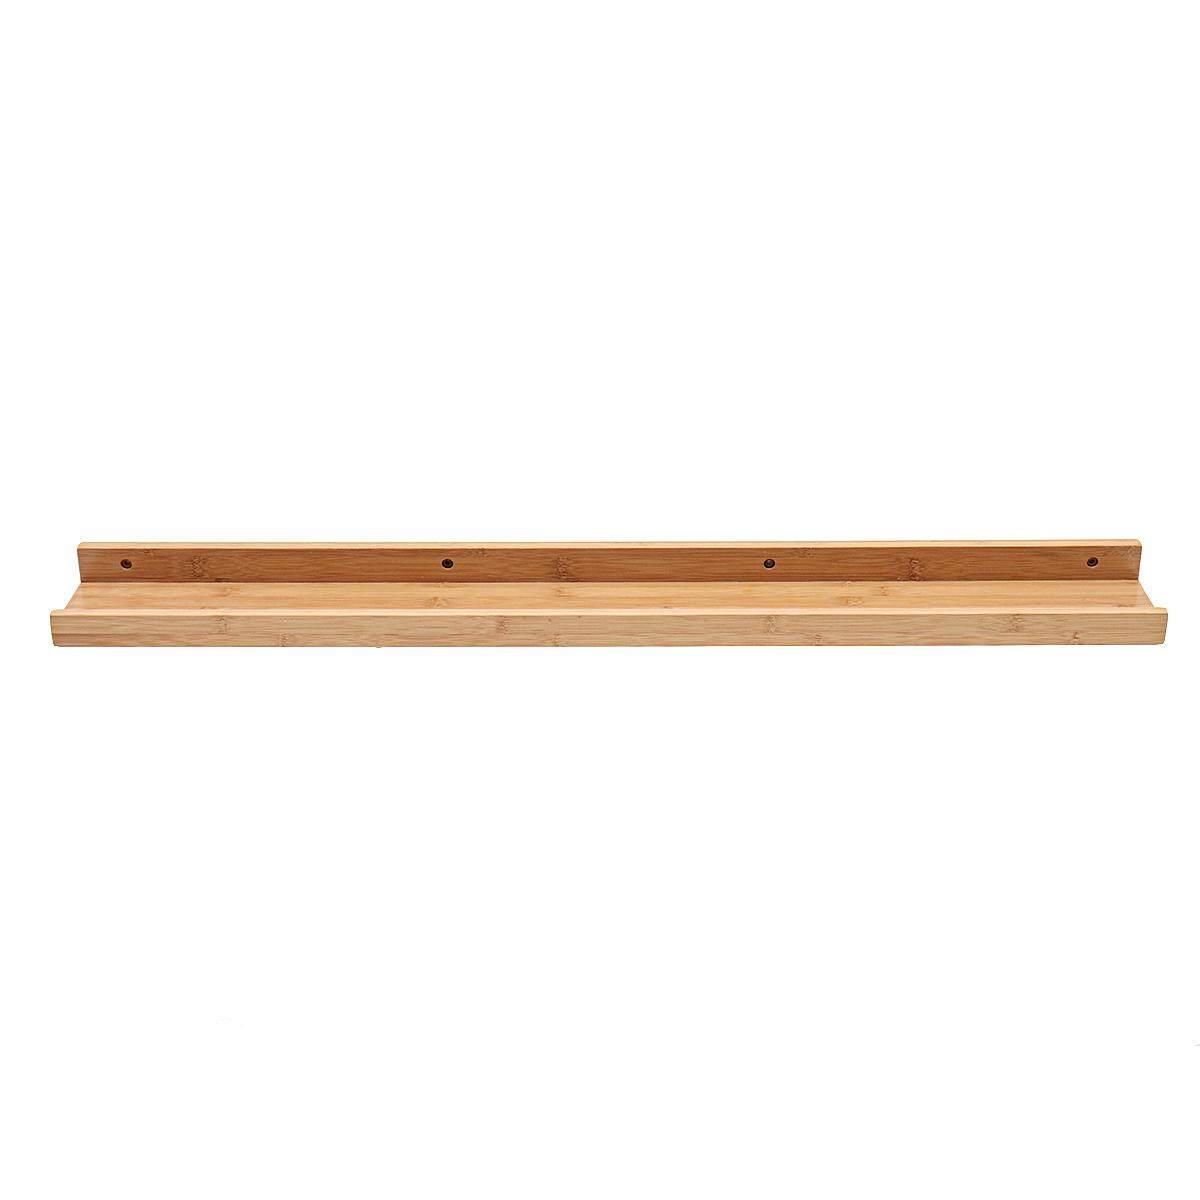 Vintage Retro Bamboo Wooden Wall Floating Shelf Storage Shelving Unit[ 95*12*5cm] - intl